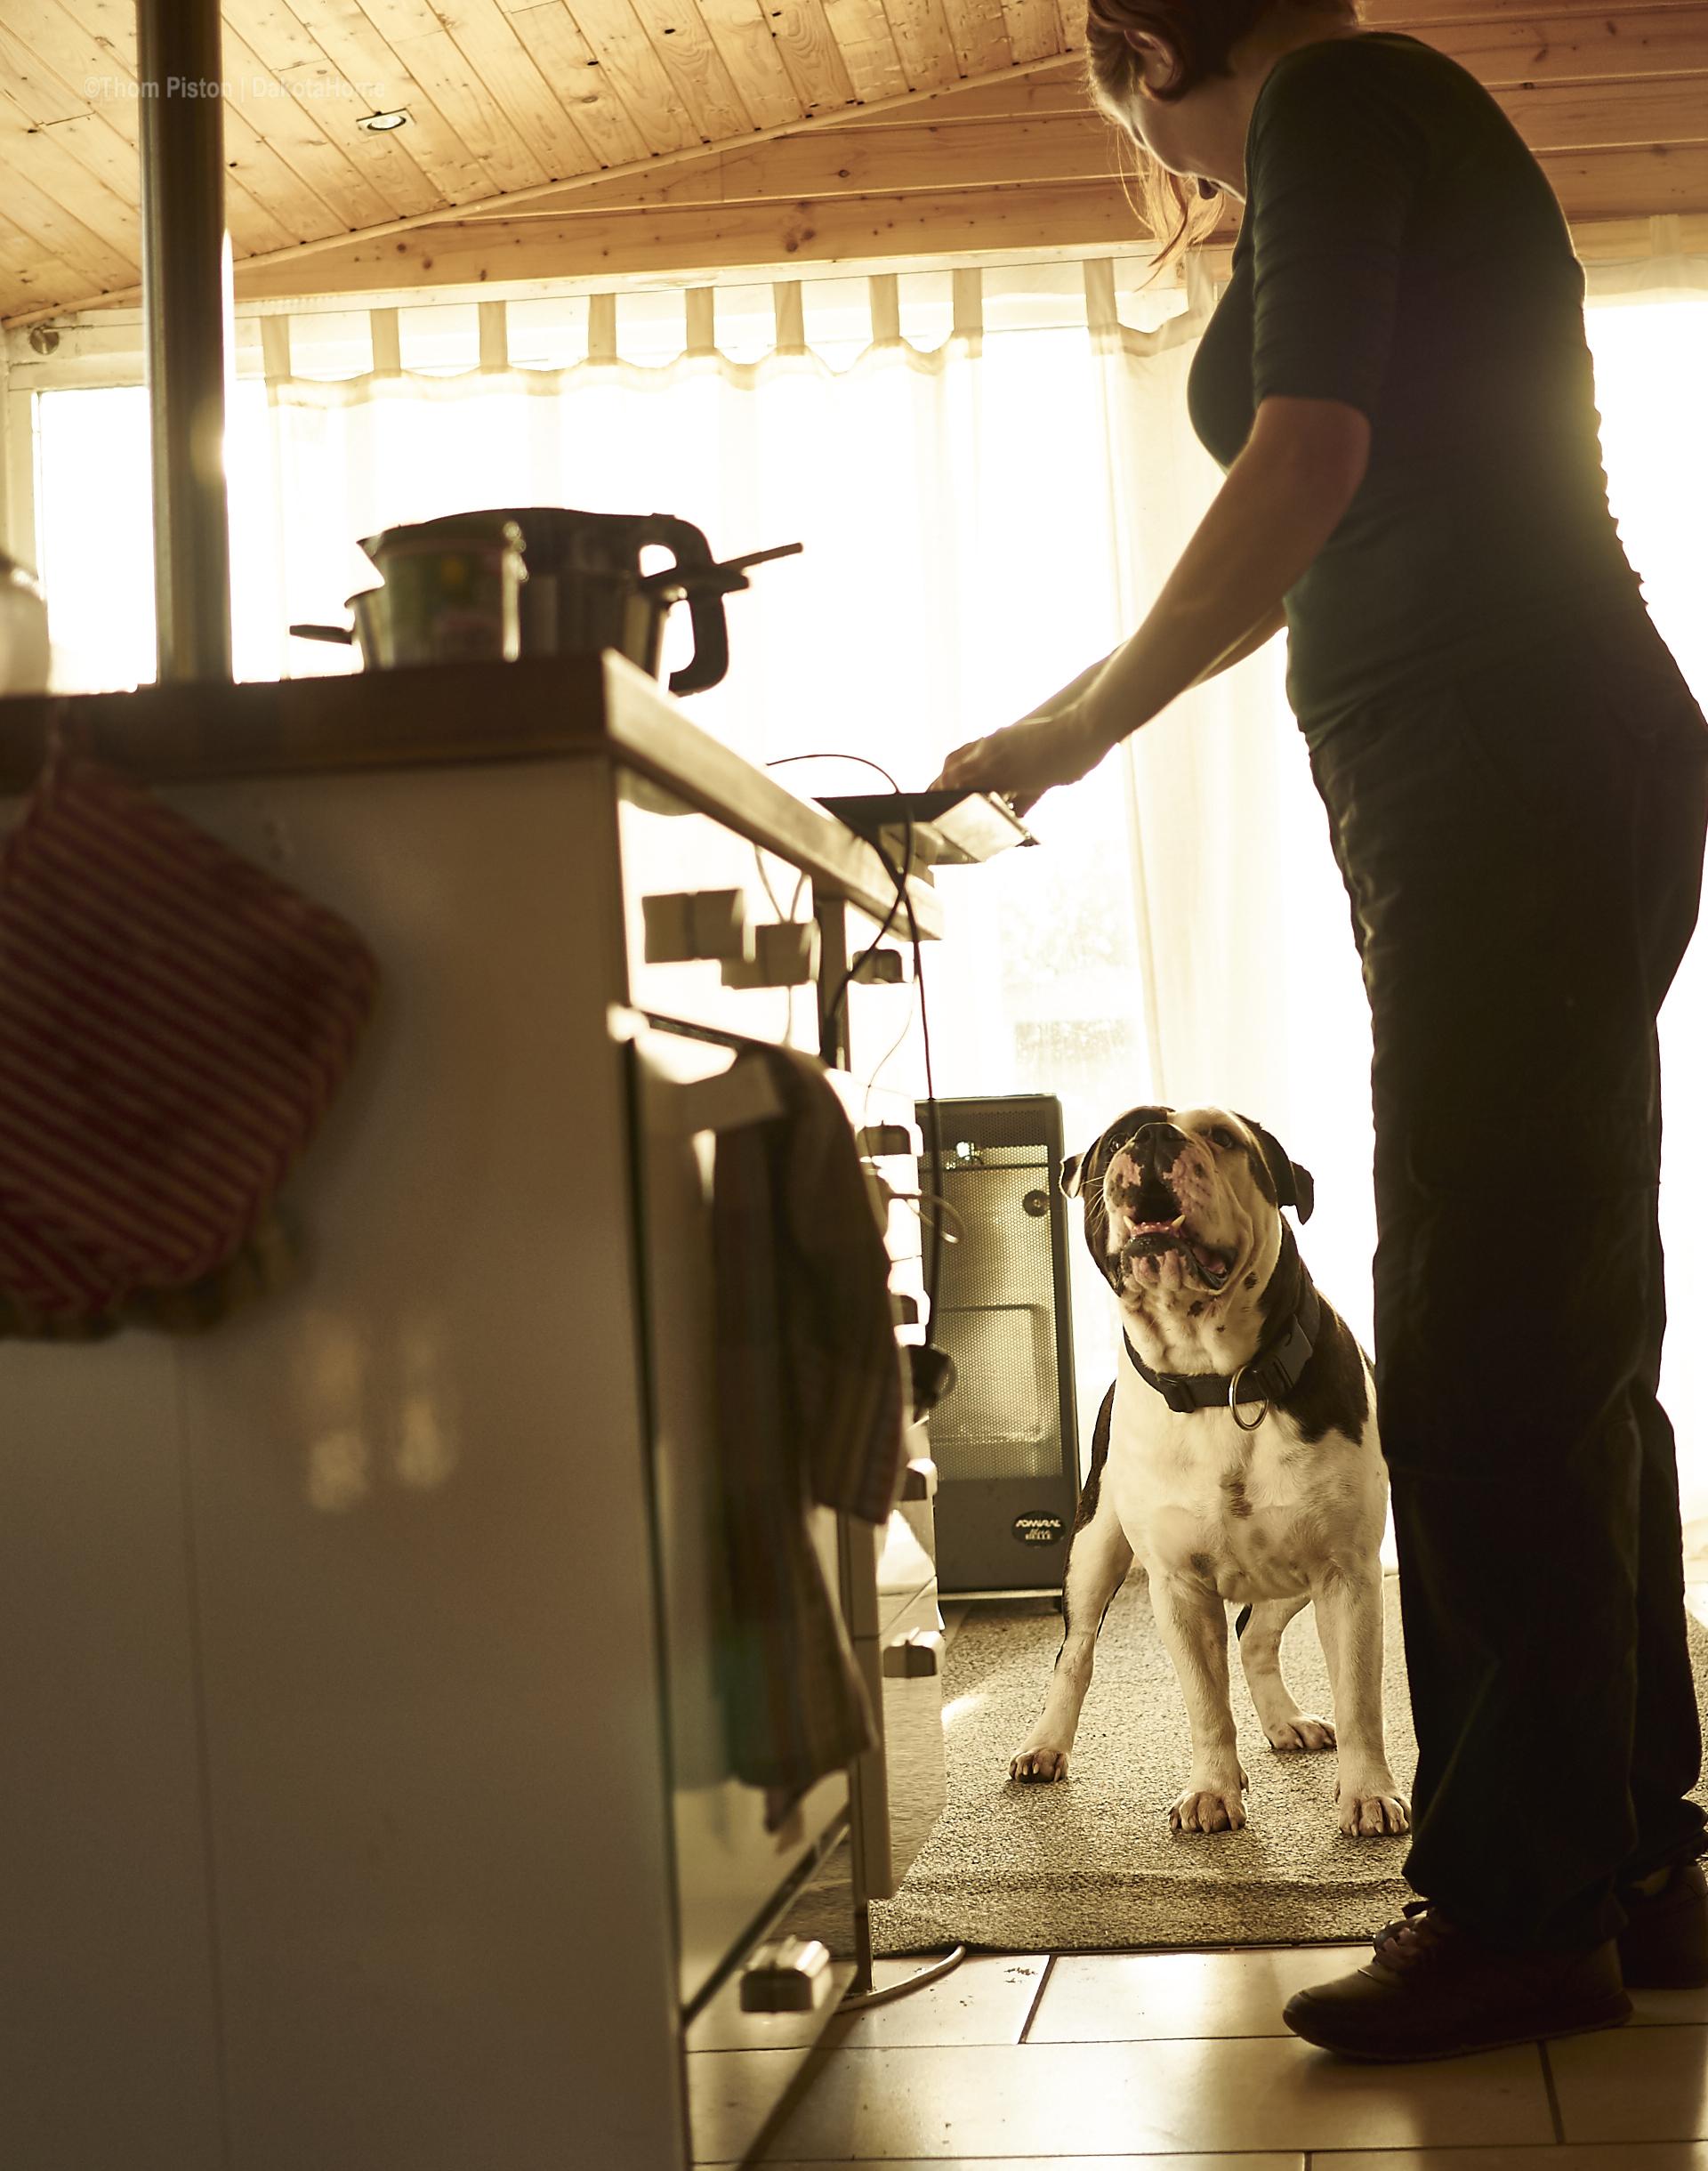 alwin the olde british bulldog muss genau wissen wie man was kocht..